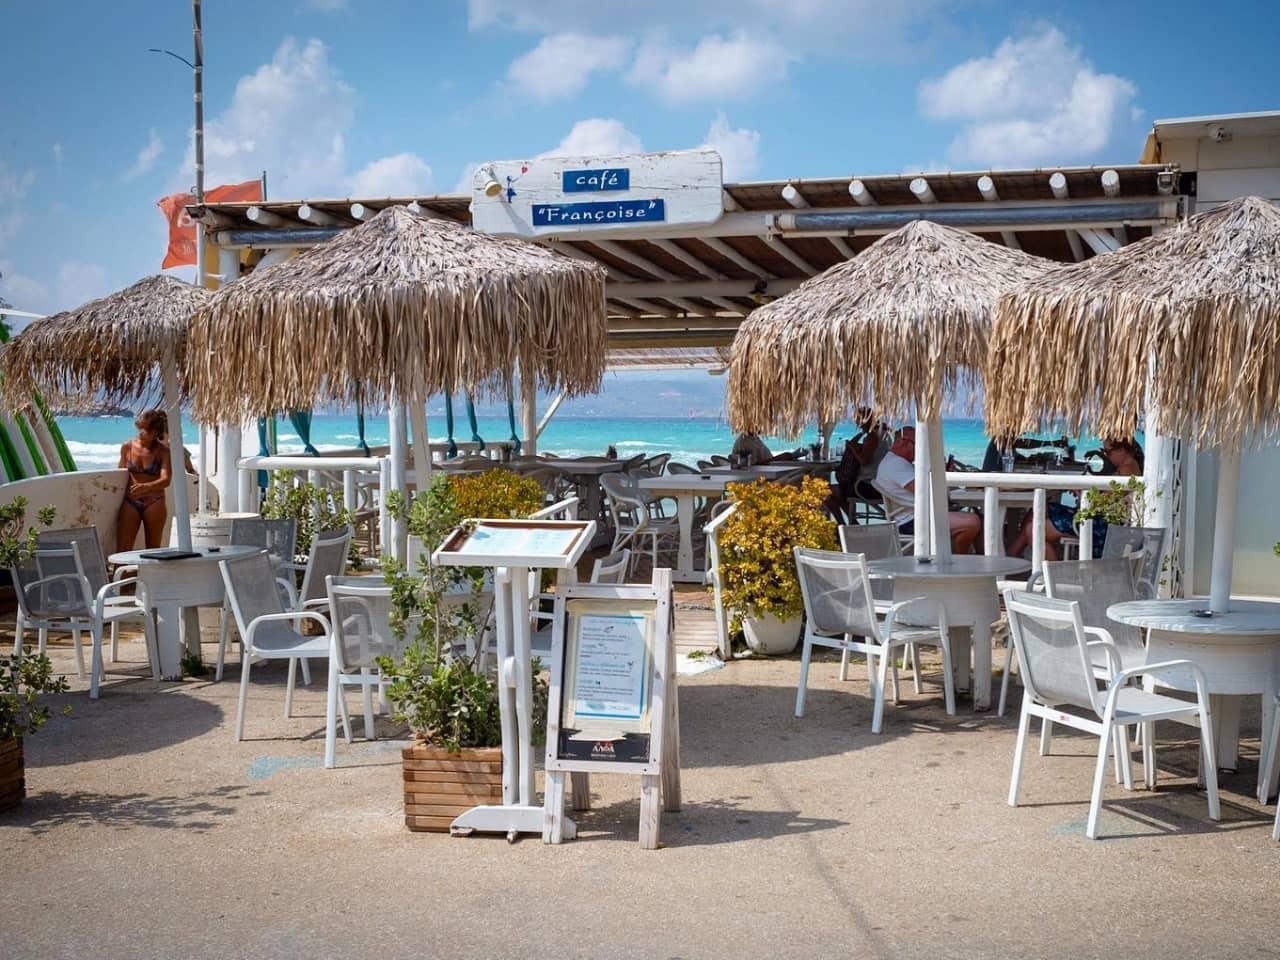 cafe almyrida chania crete, ombrosgialos beach chania, Art Retreats in Gavalochori Village, Chania, Crete, artful retreat chania crete, bleverde villas penelope orfanoudaki artist, best art retreat crete